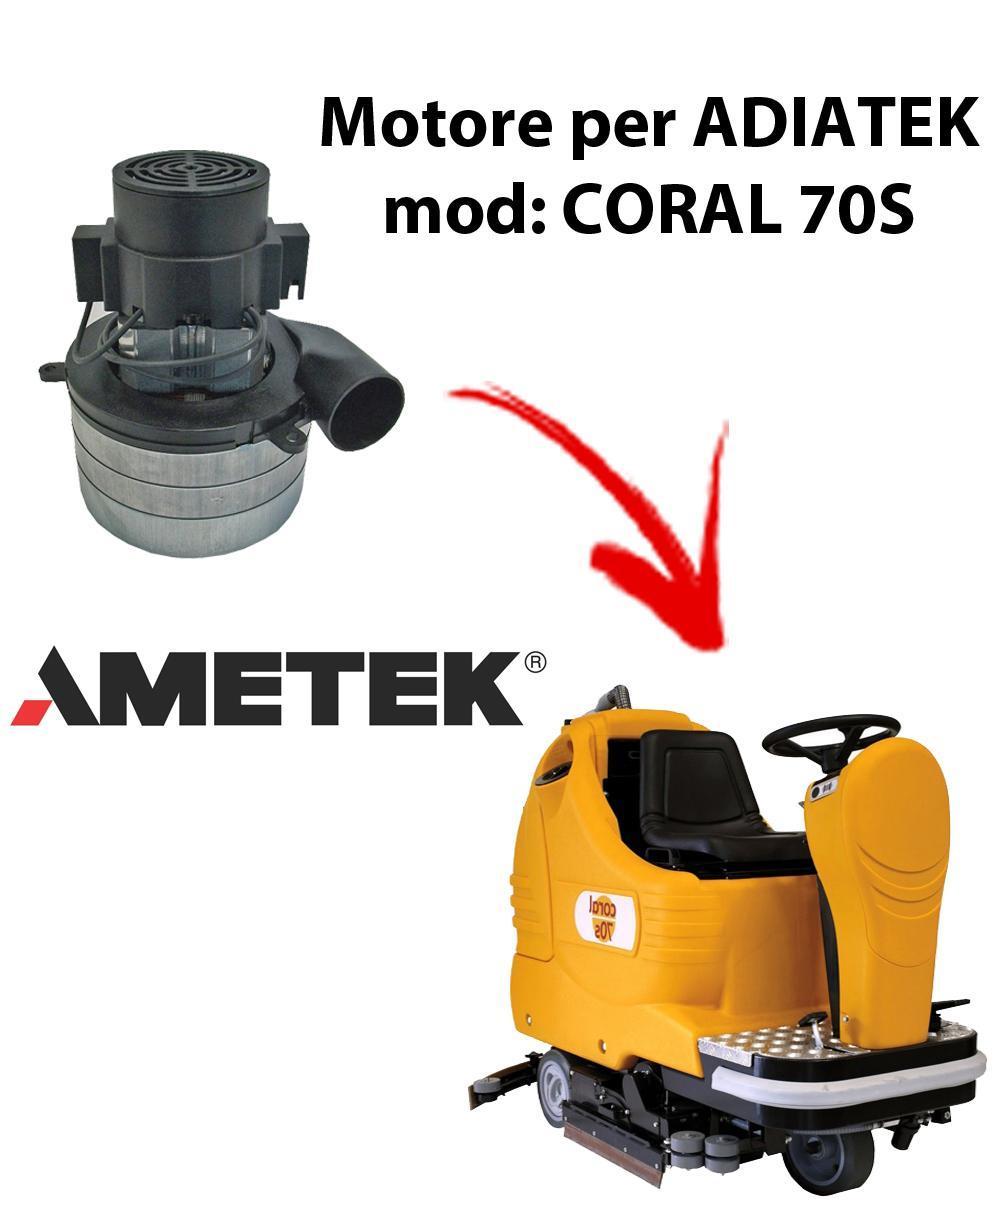 Coral 70S Motores de aspiración Ametek Italia  para fregadora Adiatek